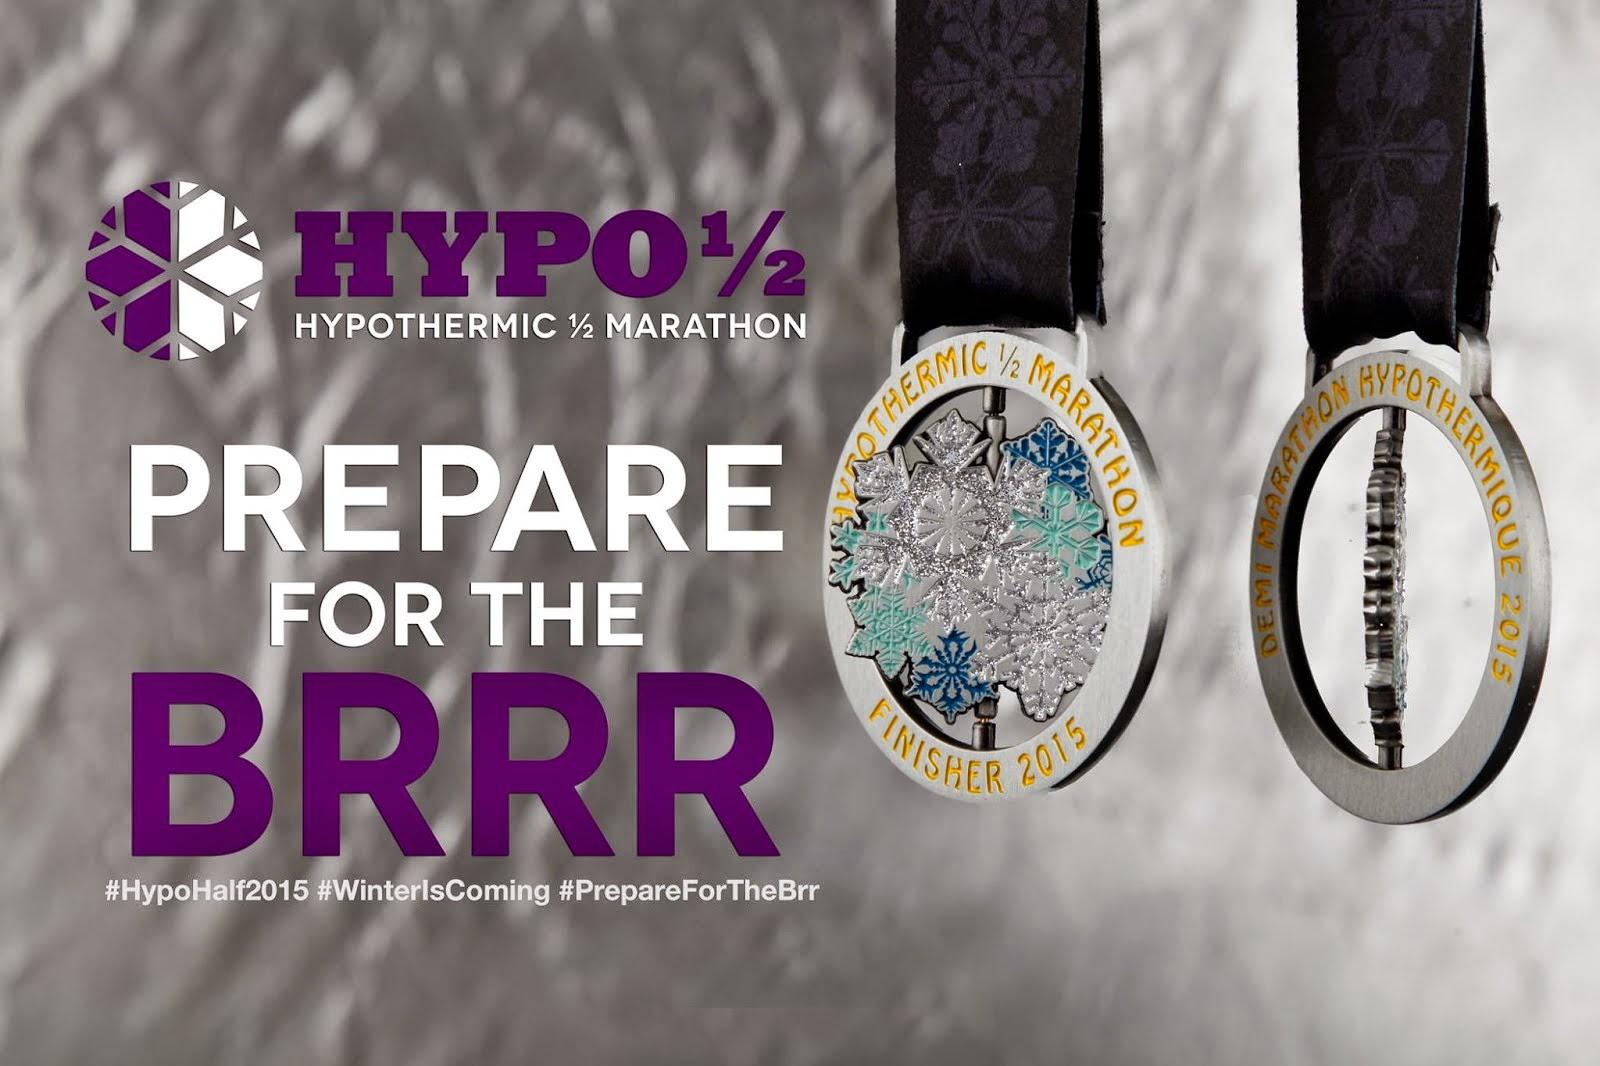 Winnipeg Hypo 1/2 Marathon